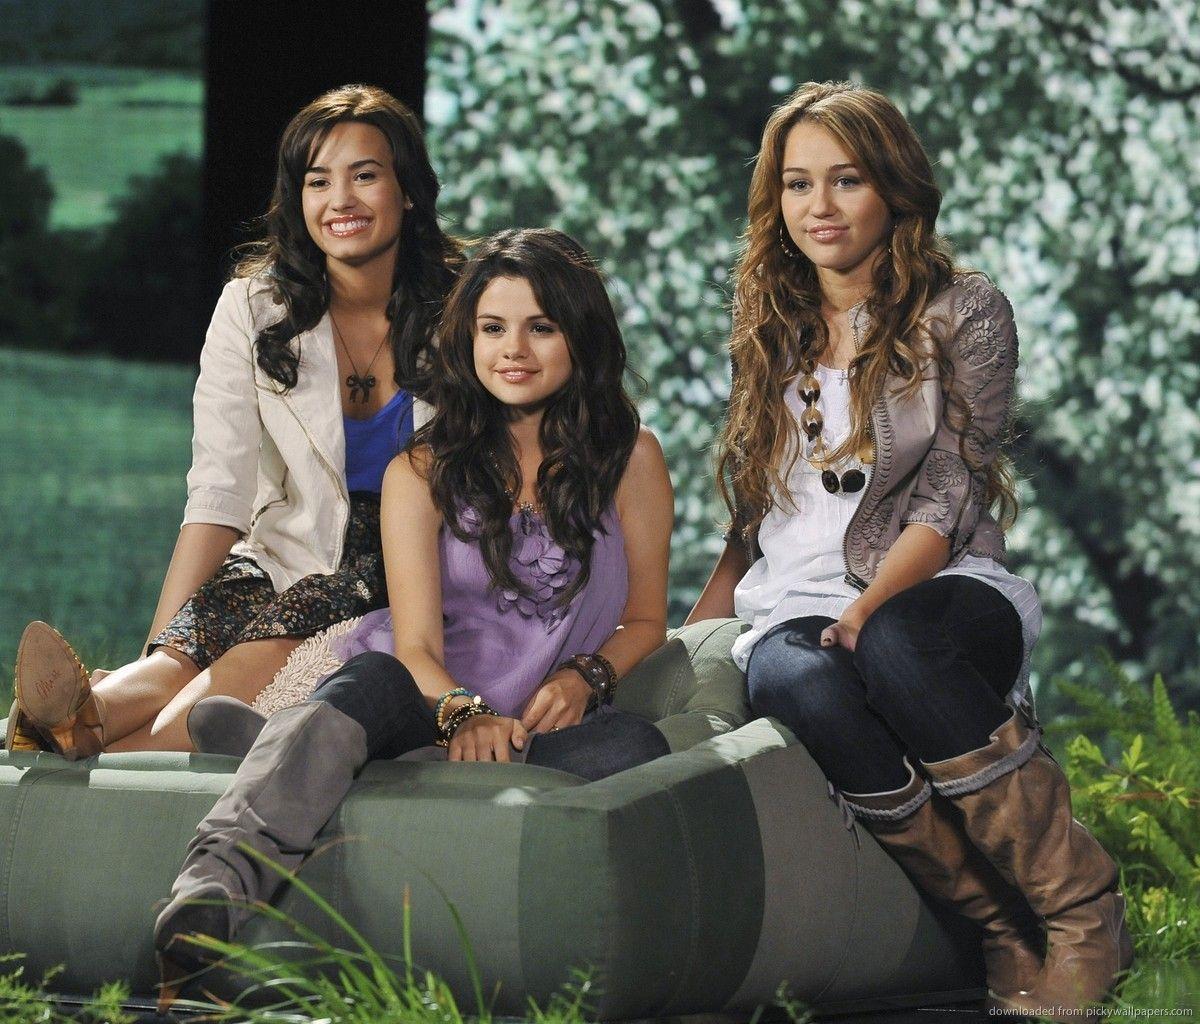 Demi Lovato Selena Gomez And Miley Cyrus Wallpaper Selena Gomez Miley Cyrus Demi Lovato Pictures Selena Gomez